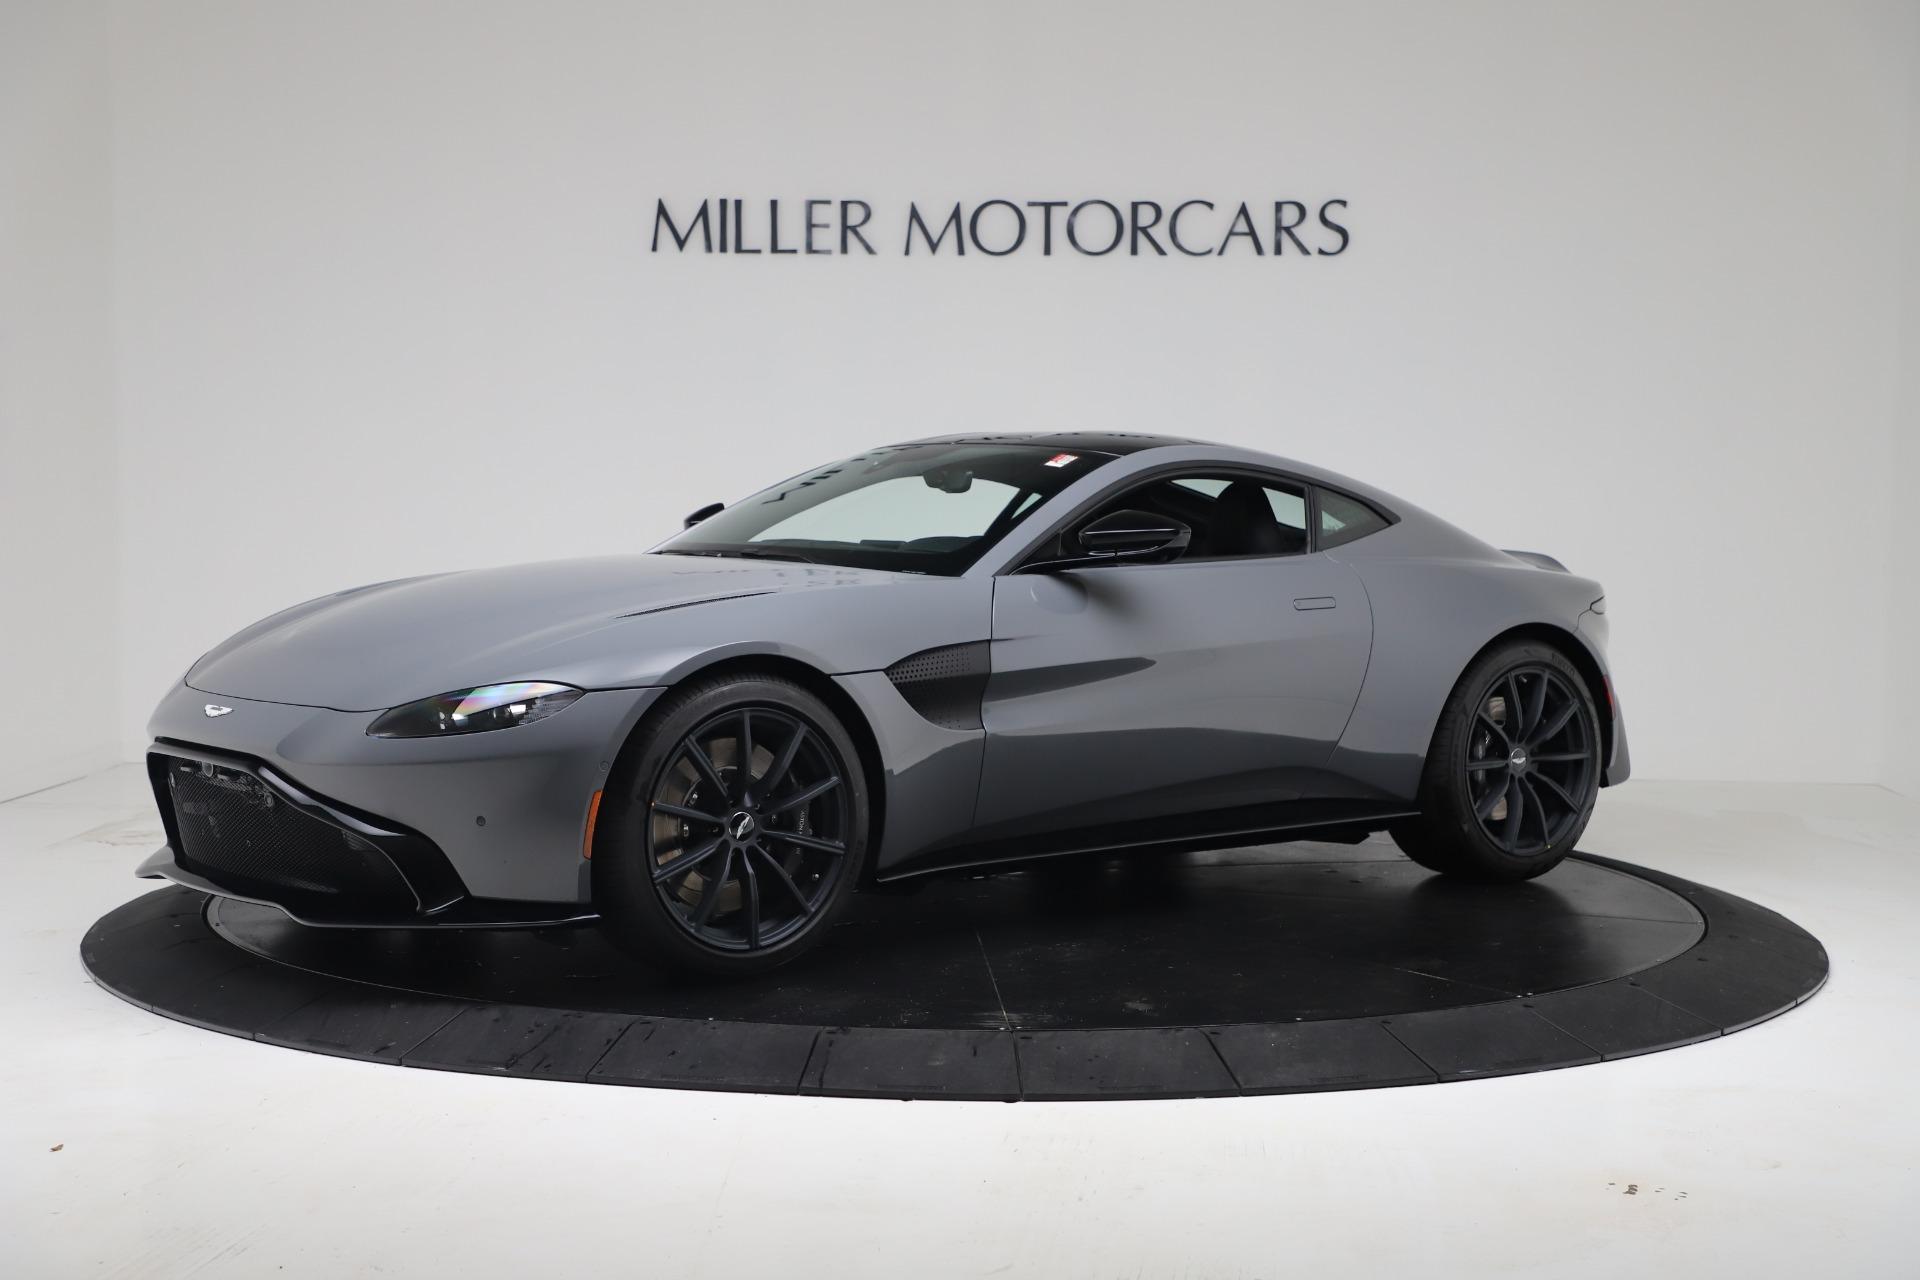 New 2020 Aston Martin Vantage V8 For Sale In Greenwich, CT 3482_p2